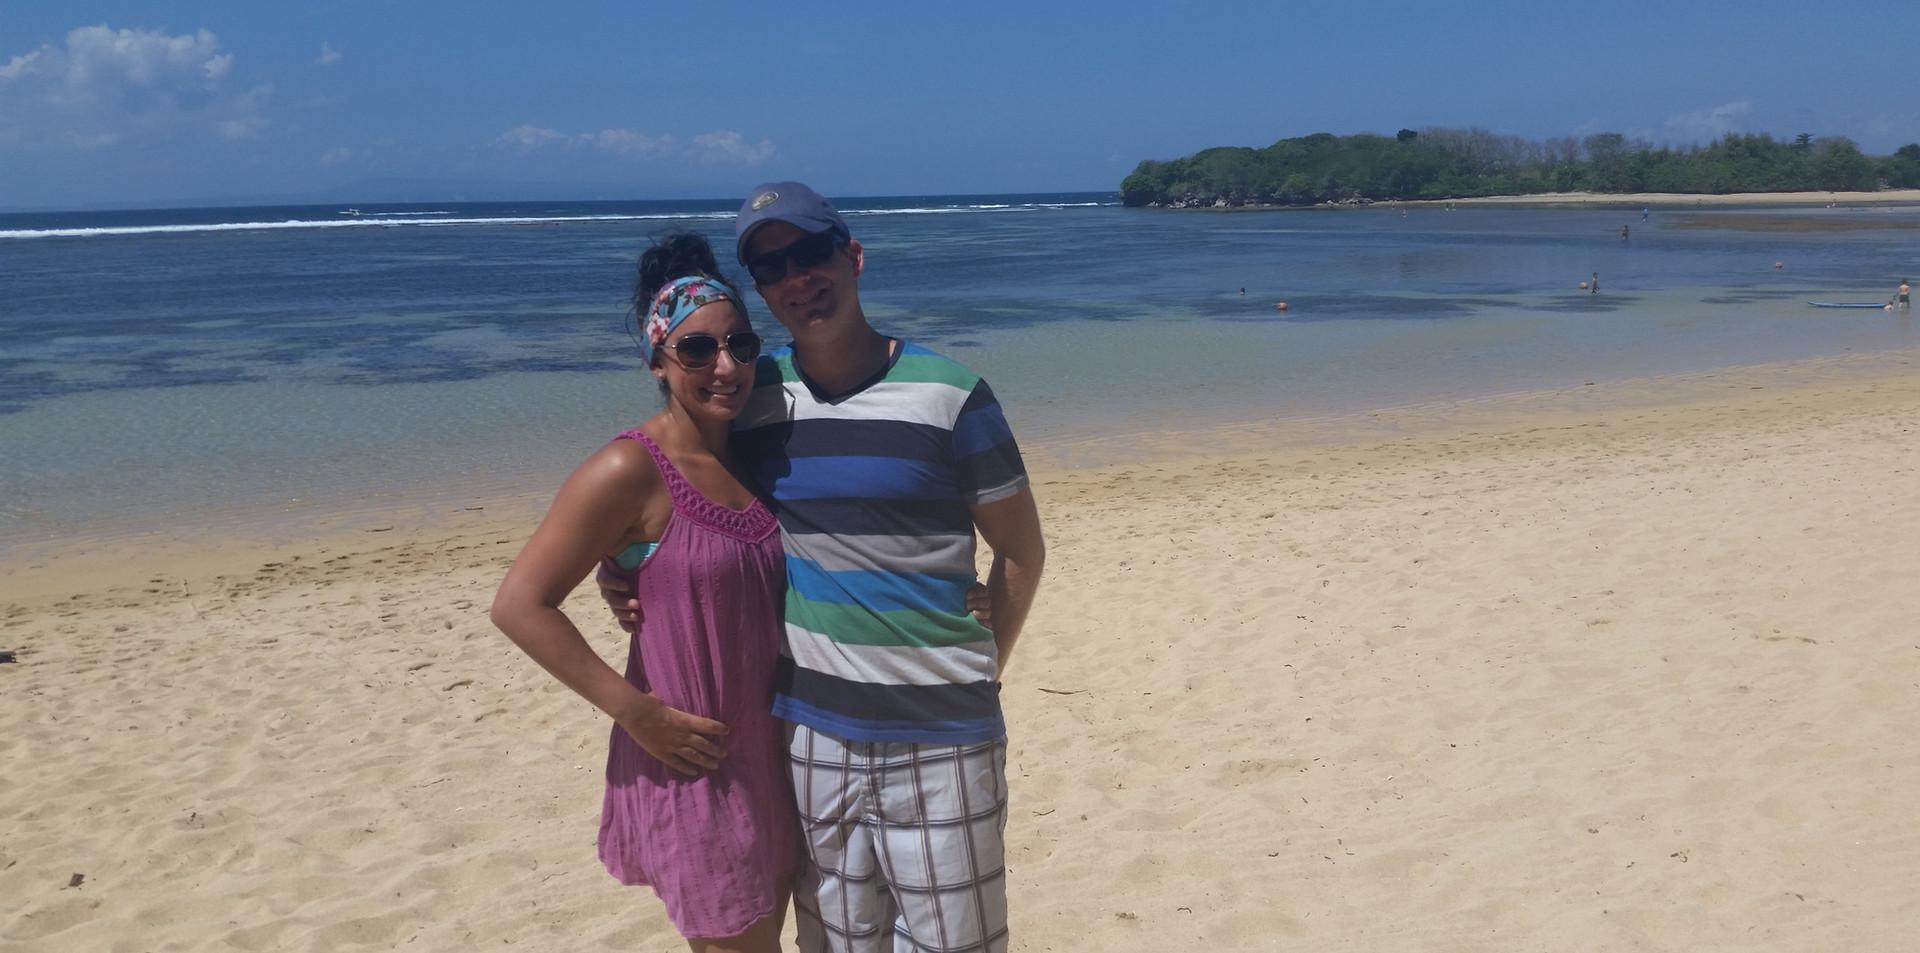 Me and Steve in Bali